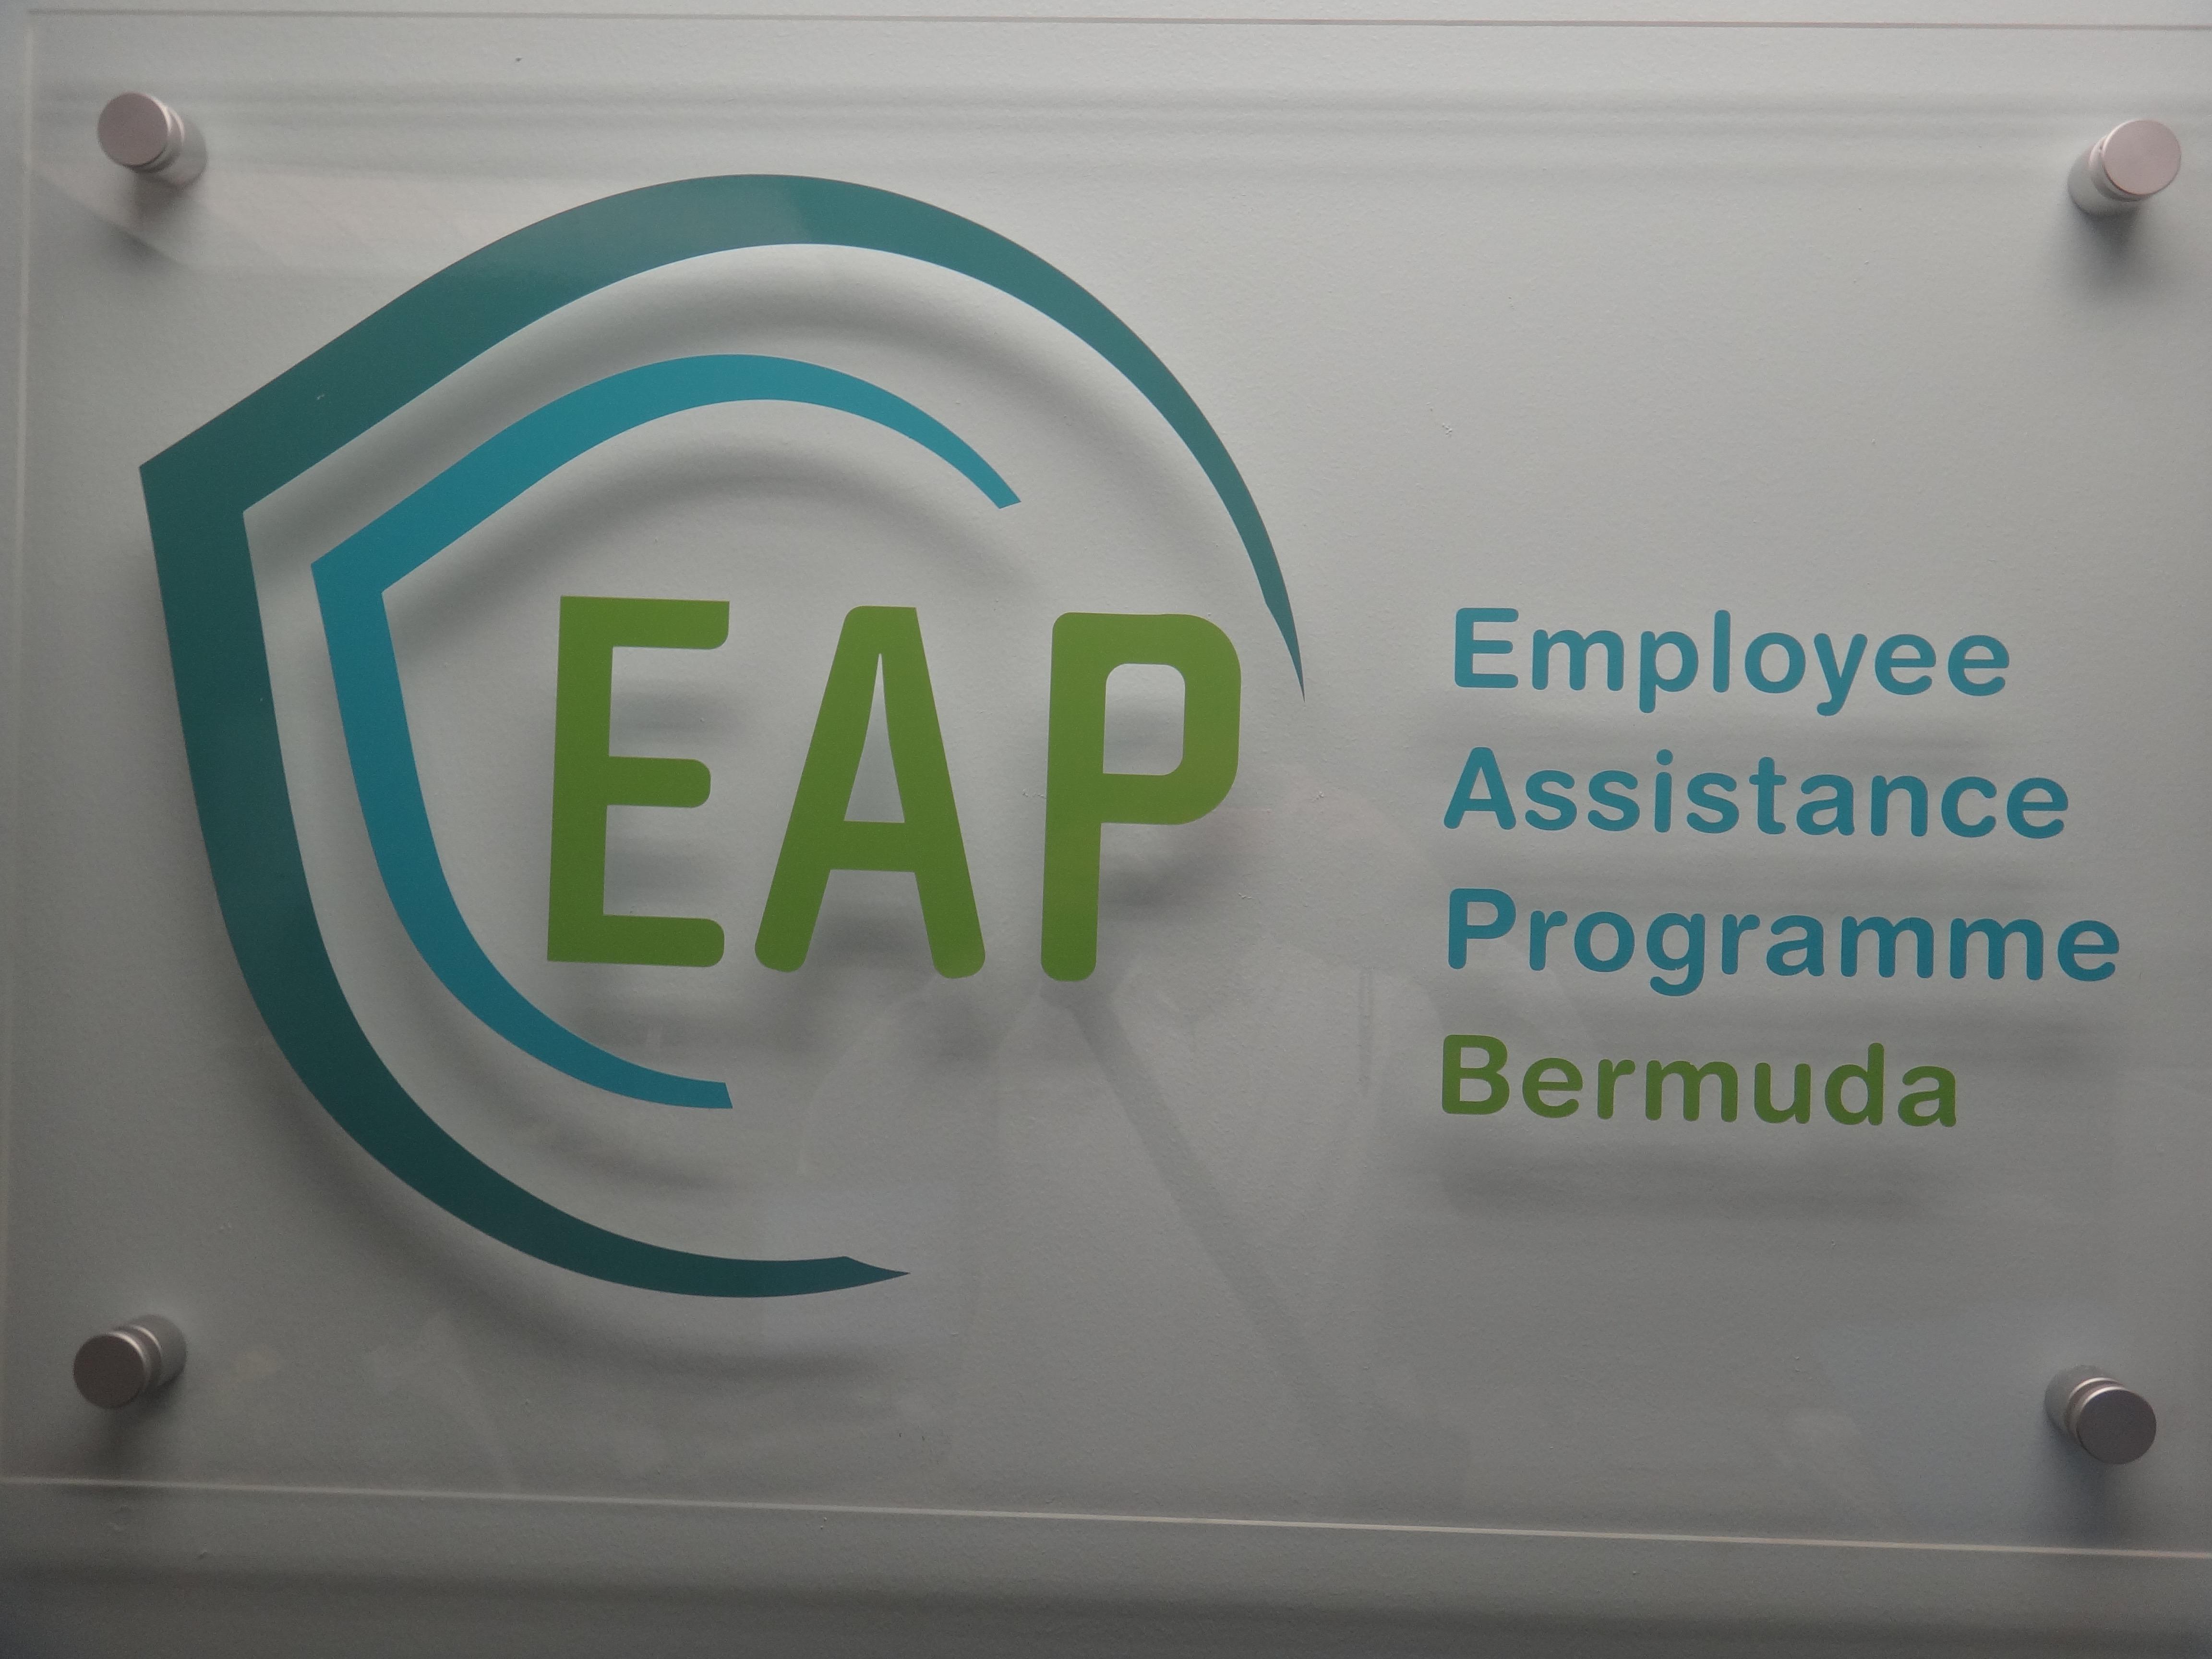 Employee Assistance Programme of Bermuda